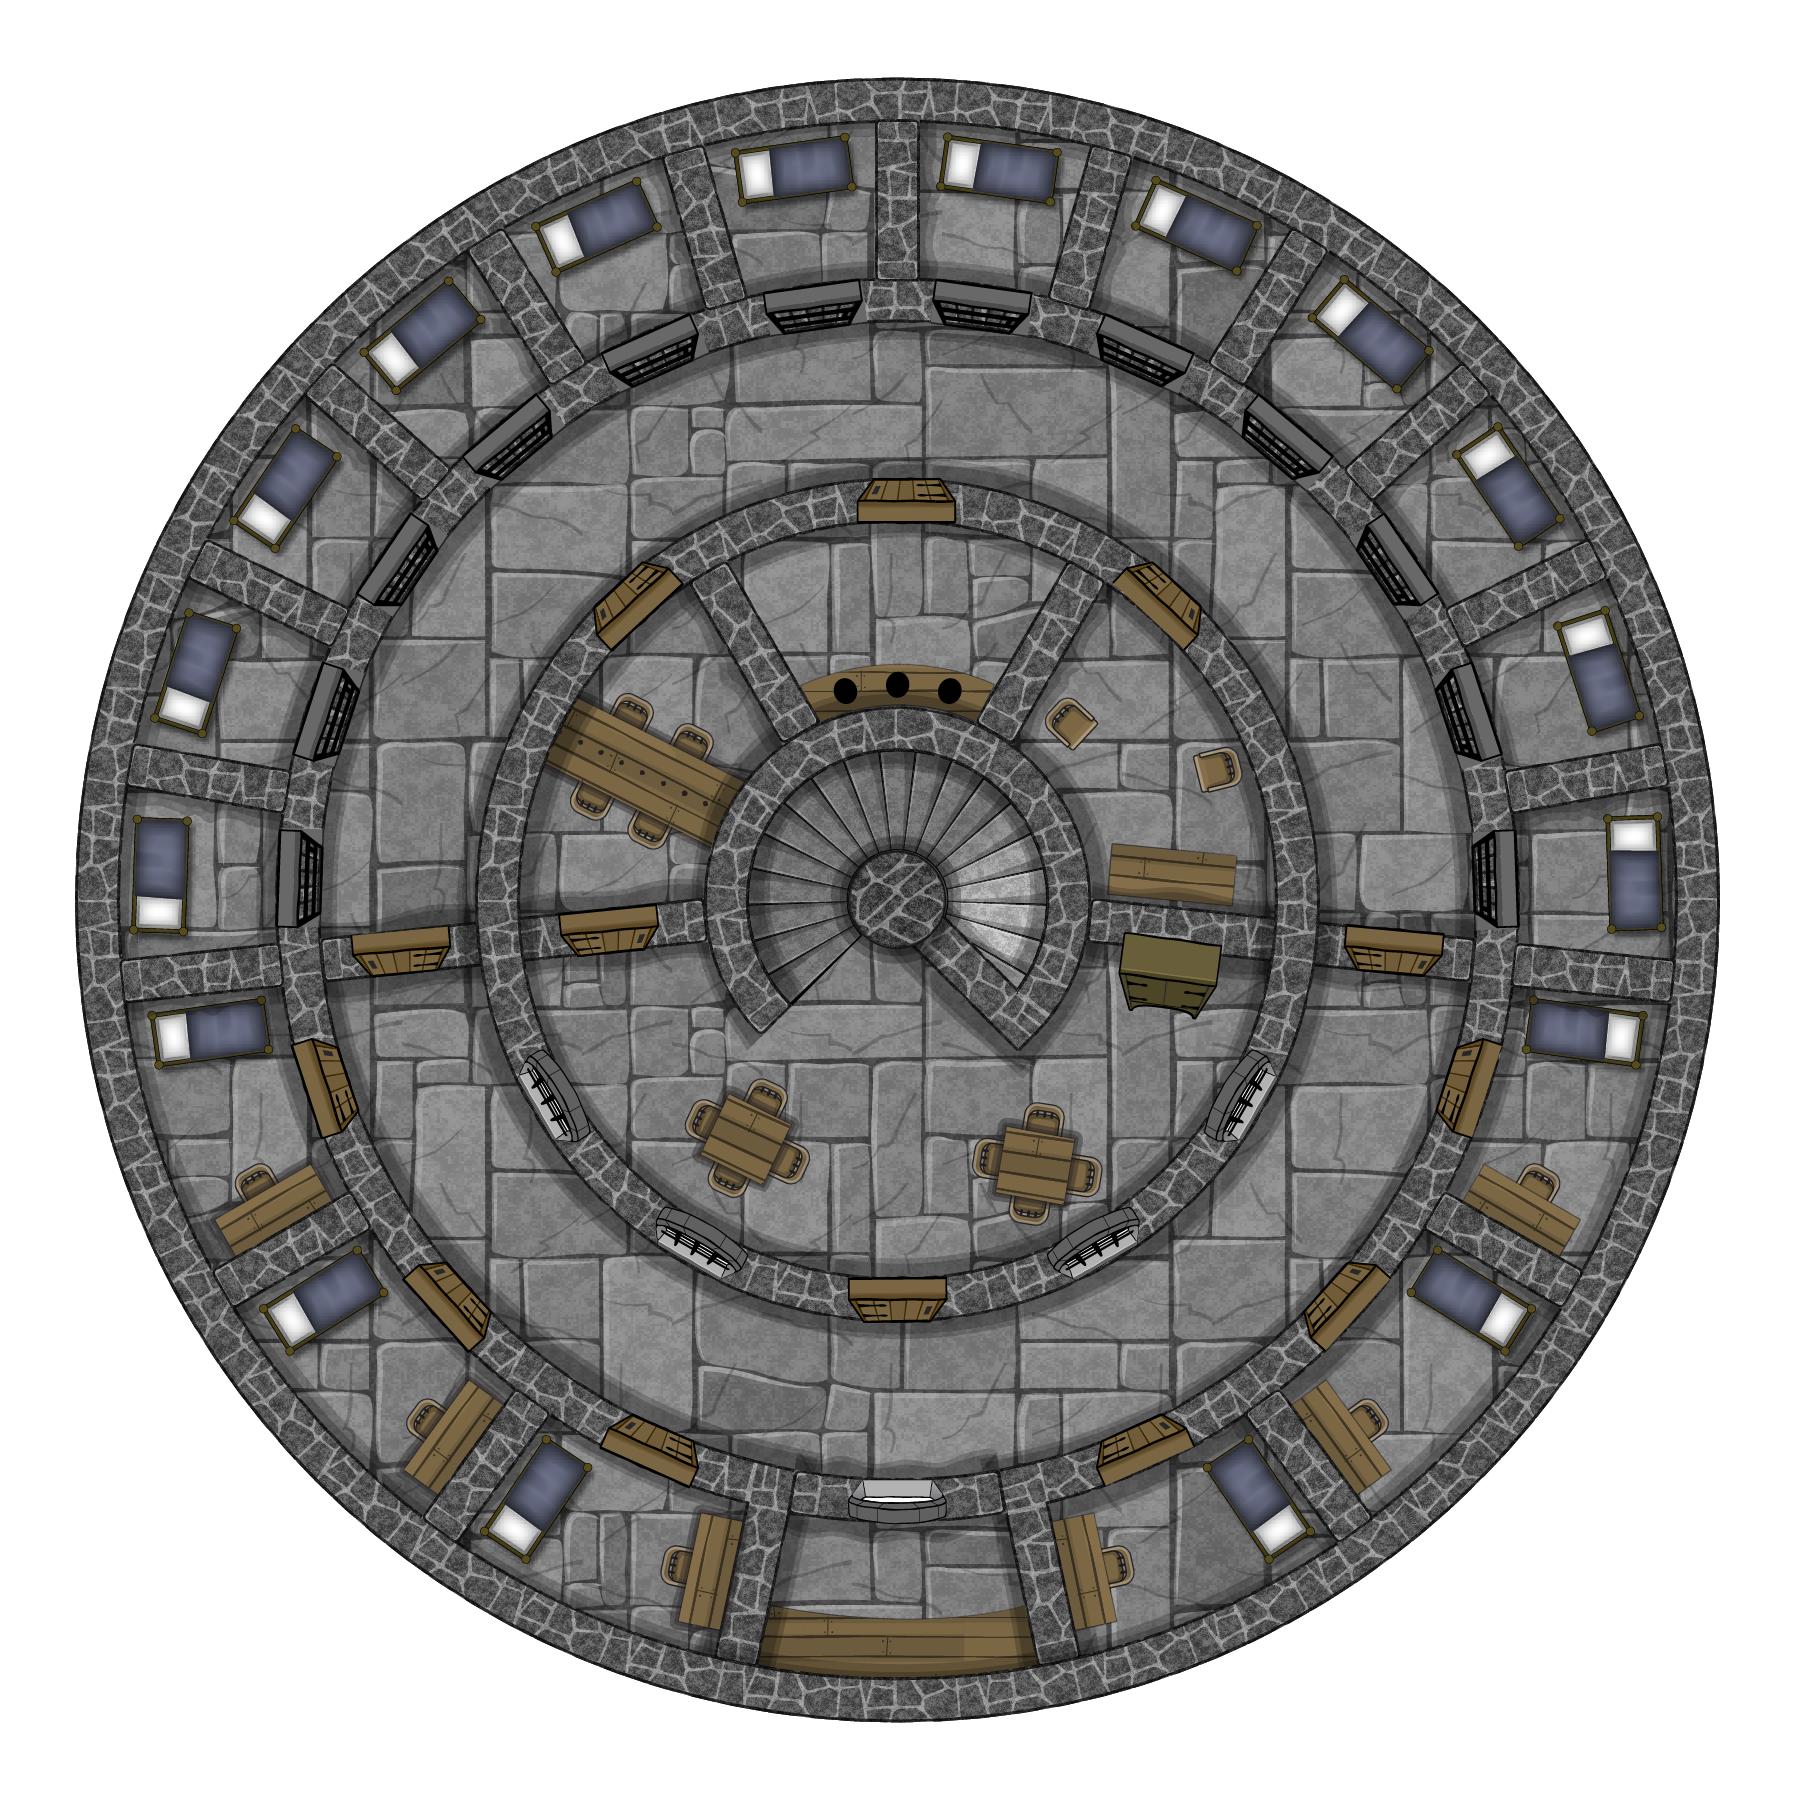 Tower Gaol